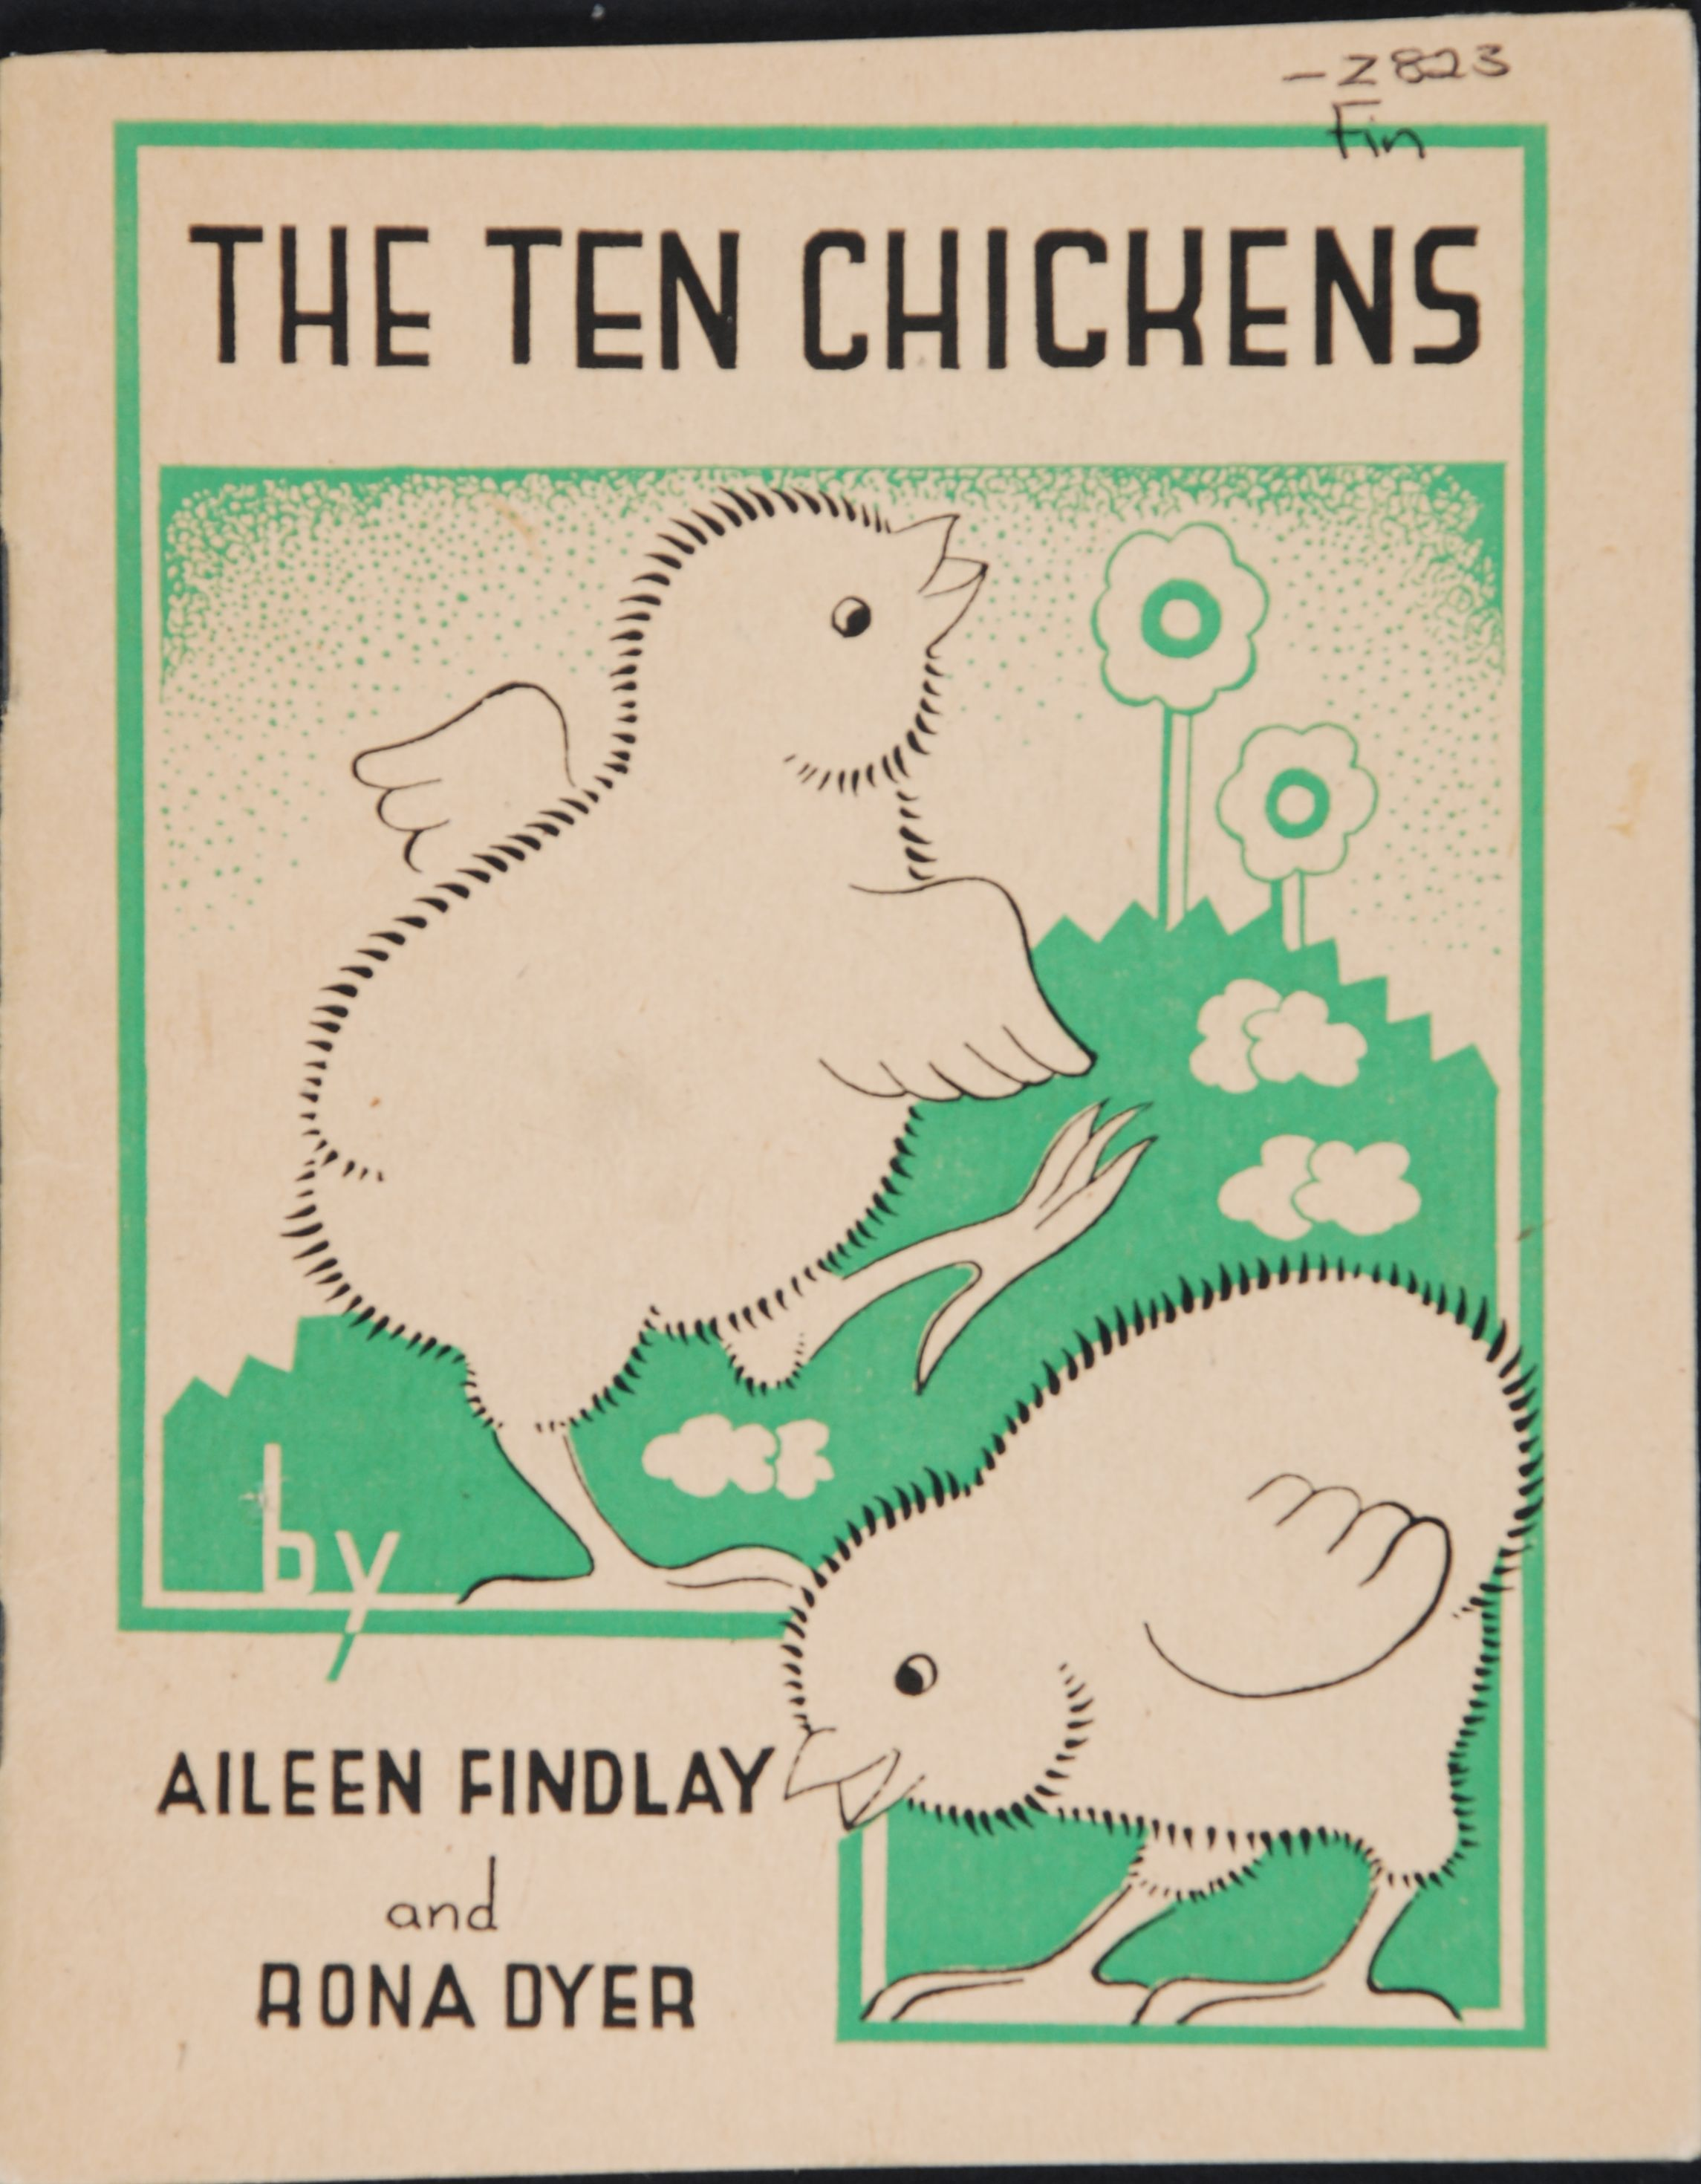 Aileen Findlay. The ten chickens. Dunedin, N.Z.: Progressive Pub. Society, c1944.